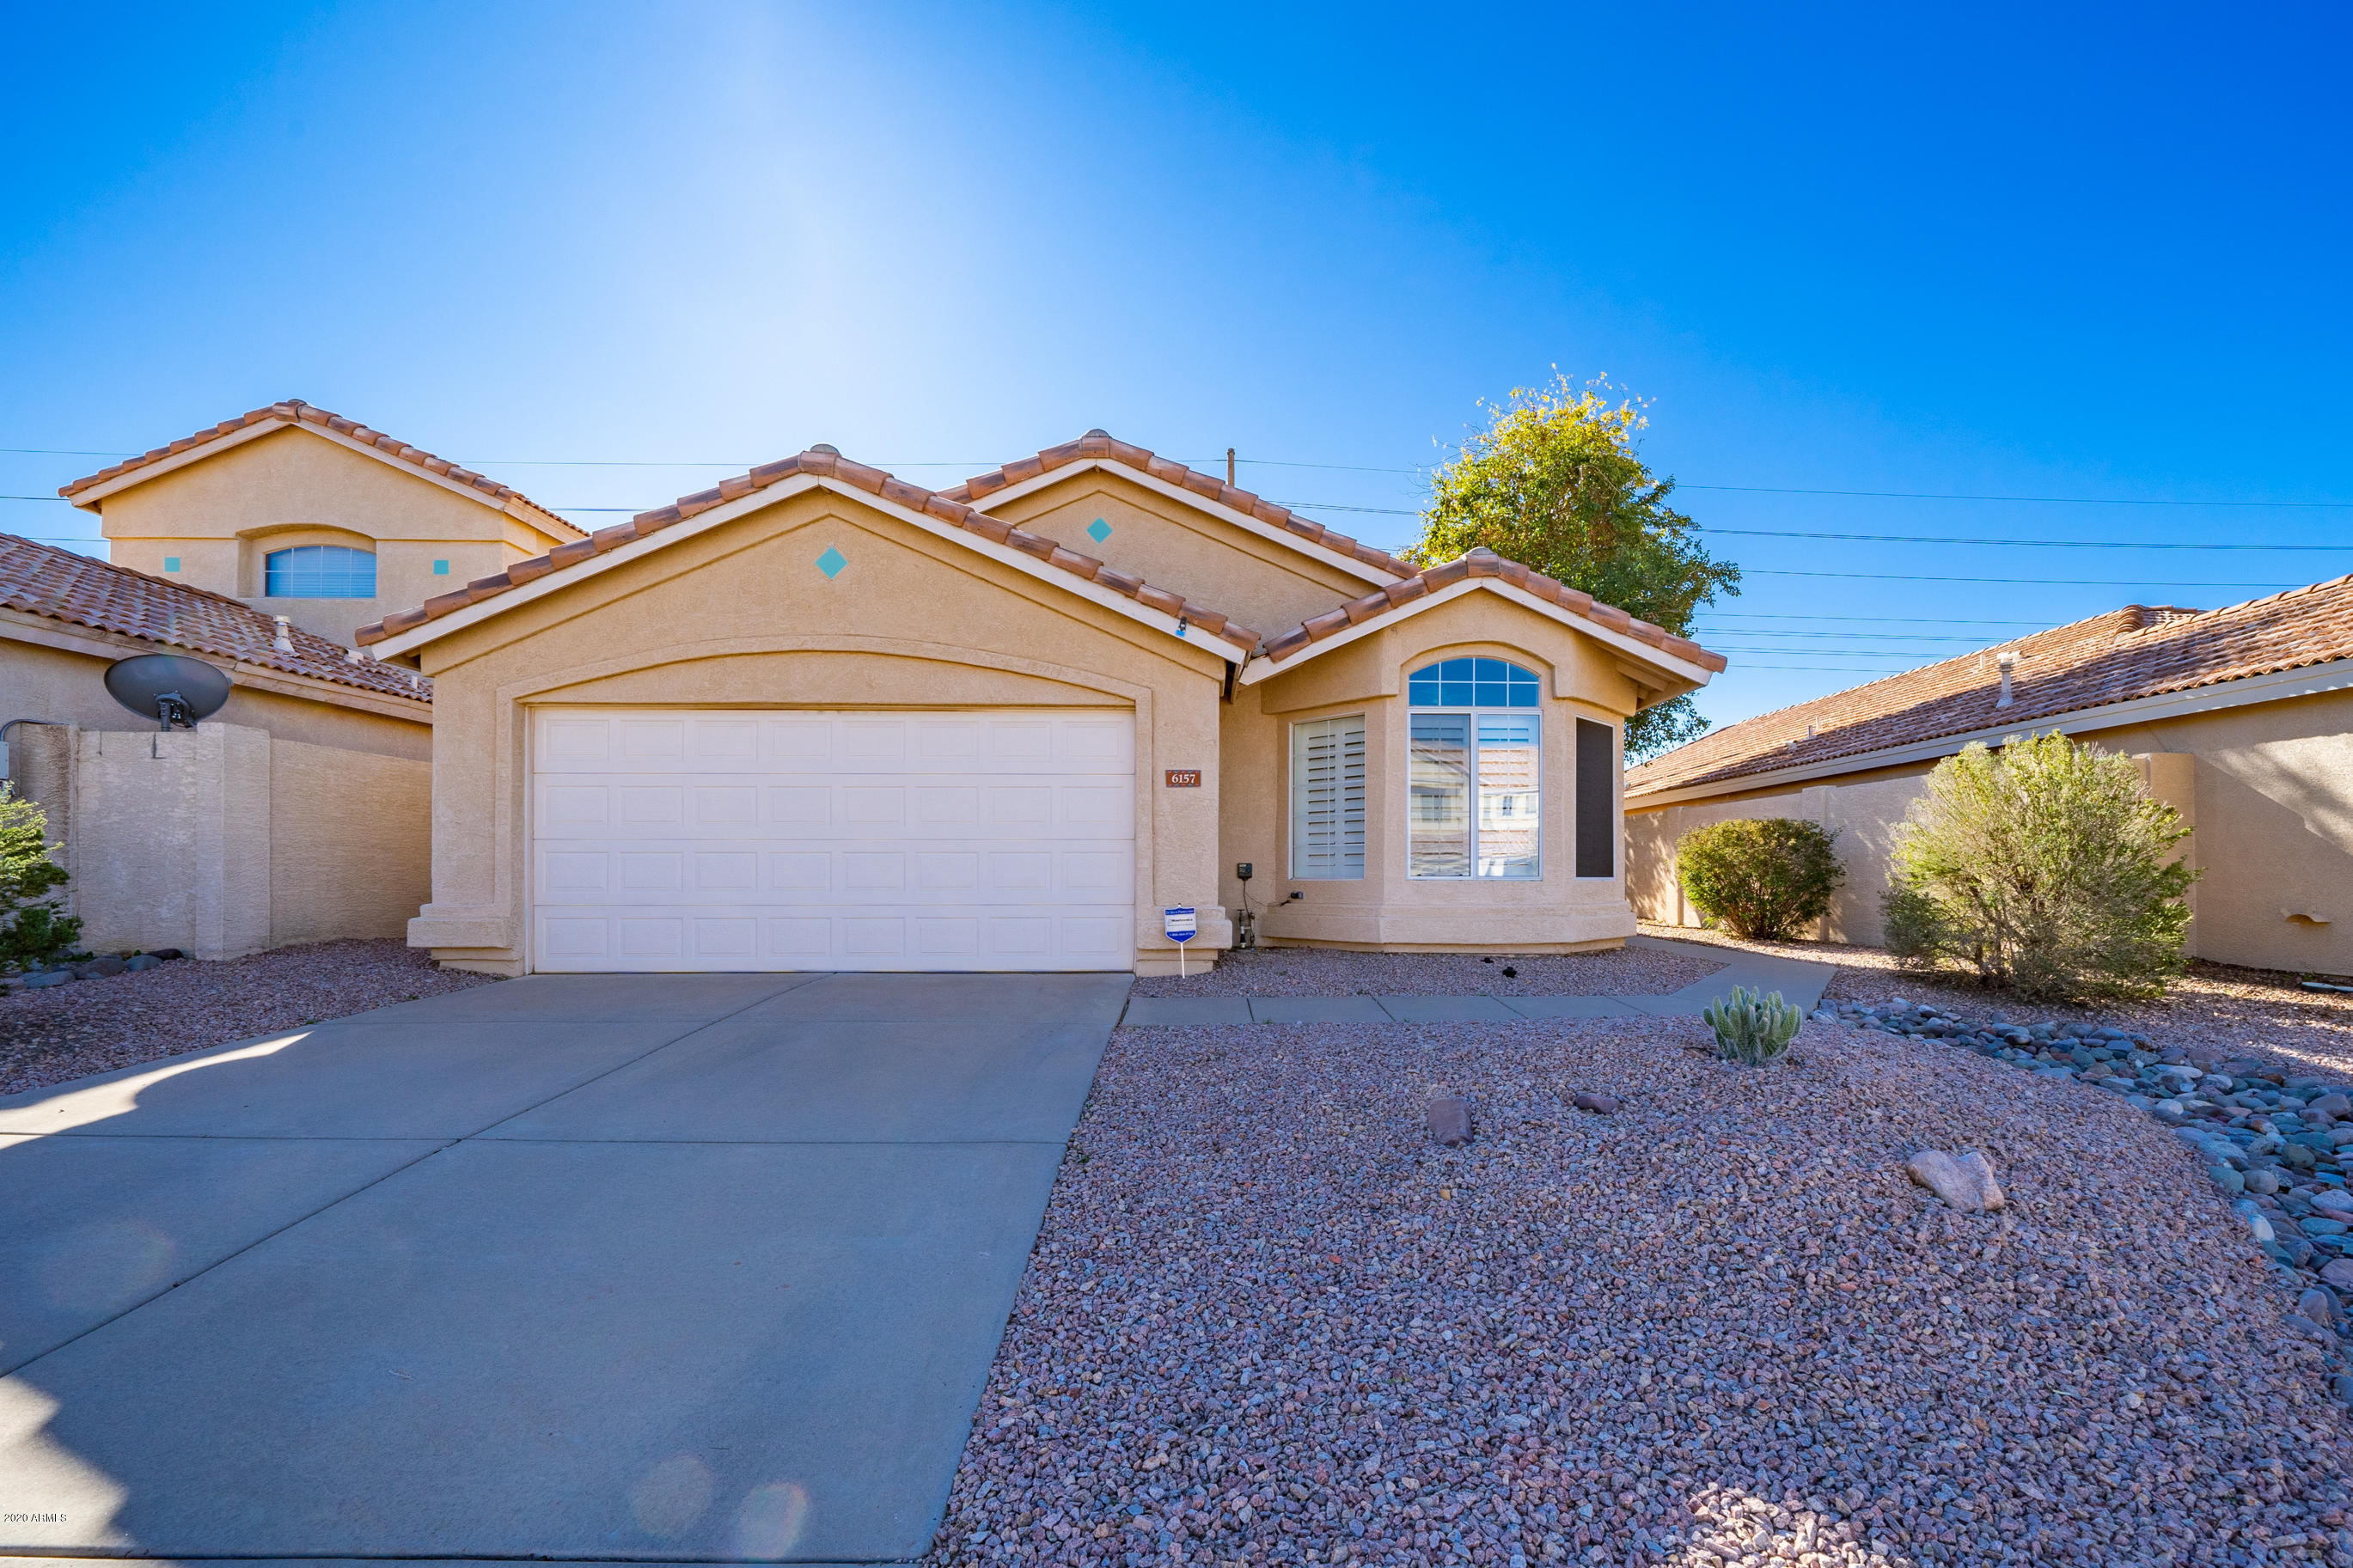 Photo of 6157 E SIERRA MORENA Street, Mesa, AZ 85215